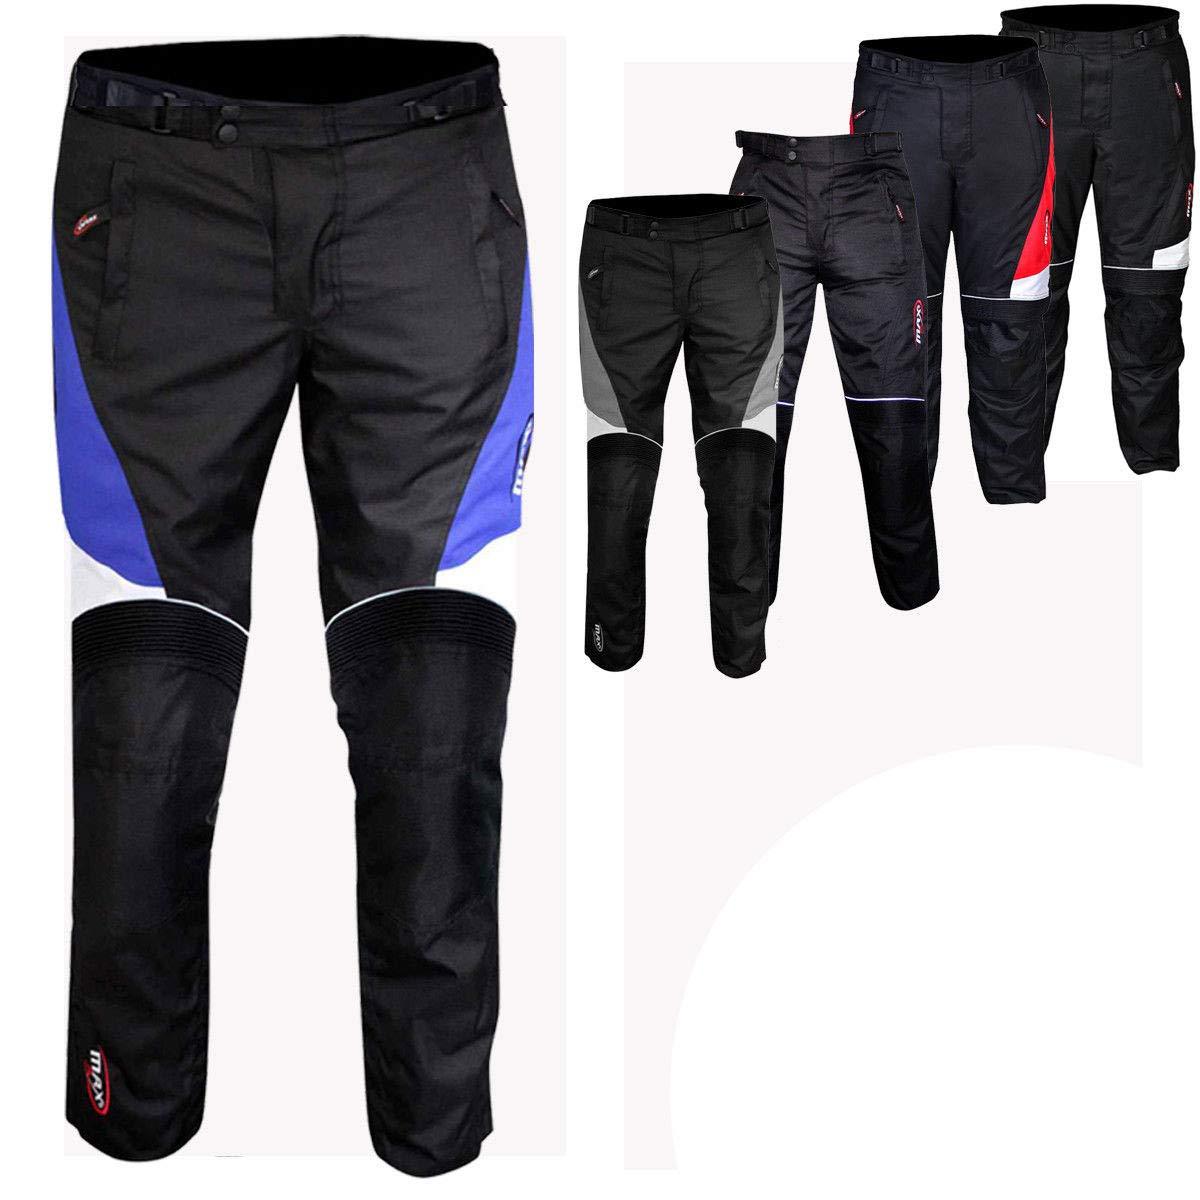 Max5 - Pantalones impermeables para motocicleta (polié ster, tejido Cordura) MKP-1450